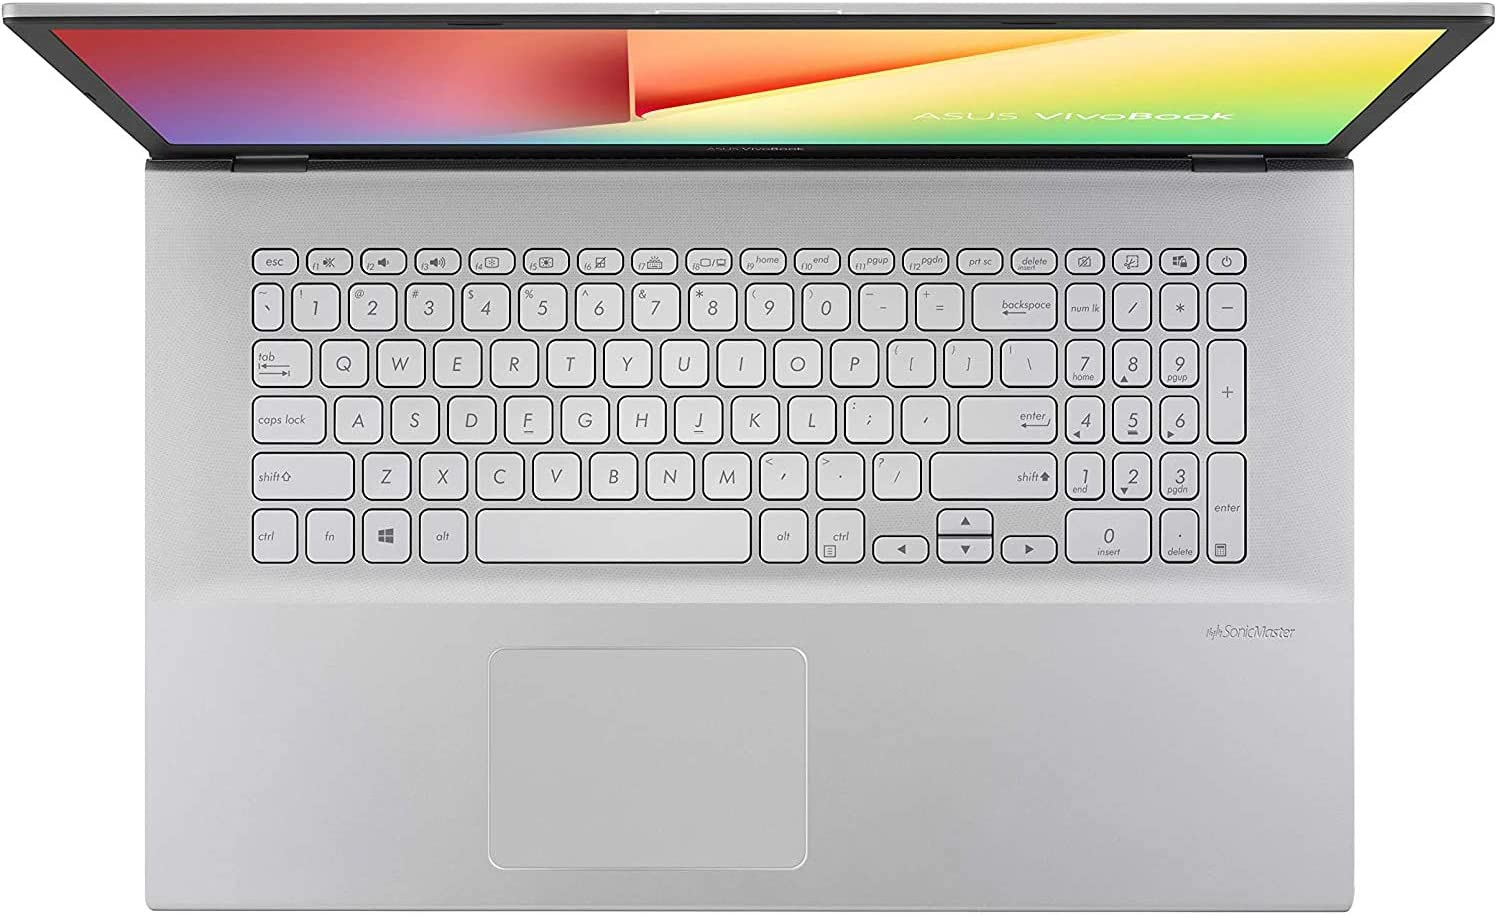 "ASUS Vivobook 17 Thin and Light Laptop 17.3"" FHD AMD Ryzen 3 3250U up to 3.50 GHz Radeon Vega 3 Graphics 12GB DDR4 RAM 256GB SSD Keypad USB-C HDMI Wi-Fi Mouse Win 10 QWERTY US Version"